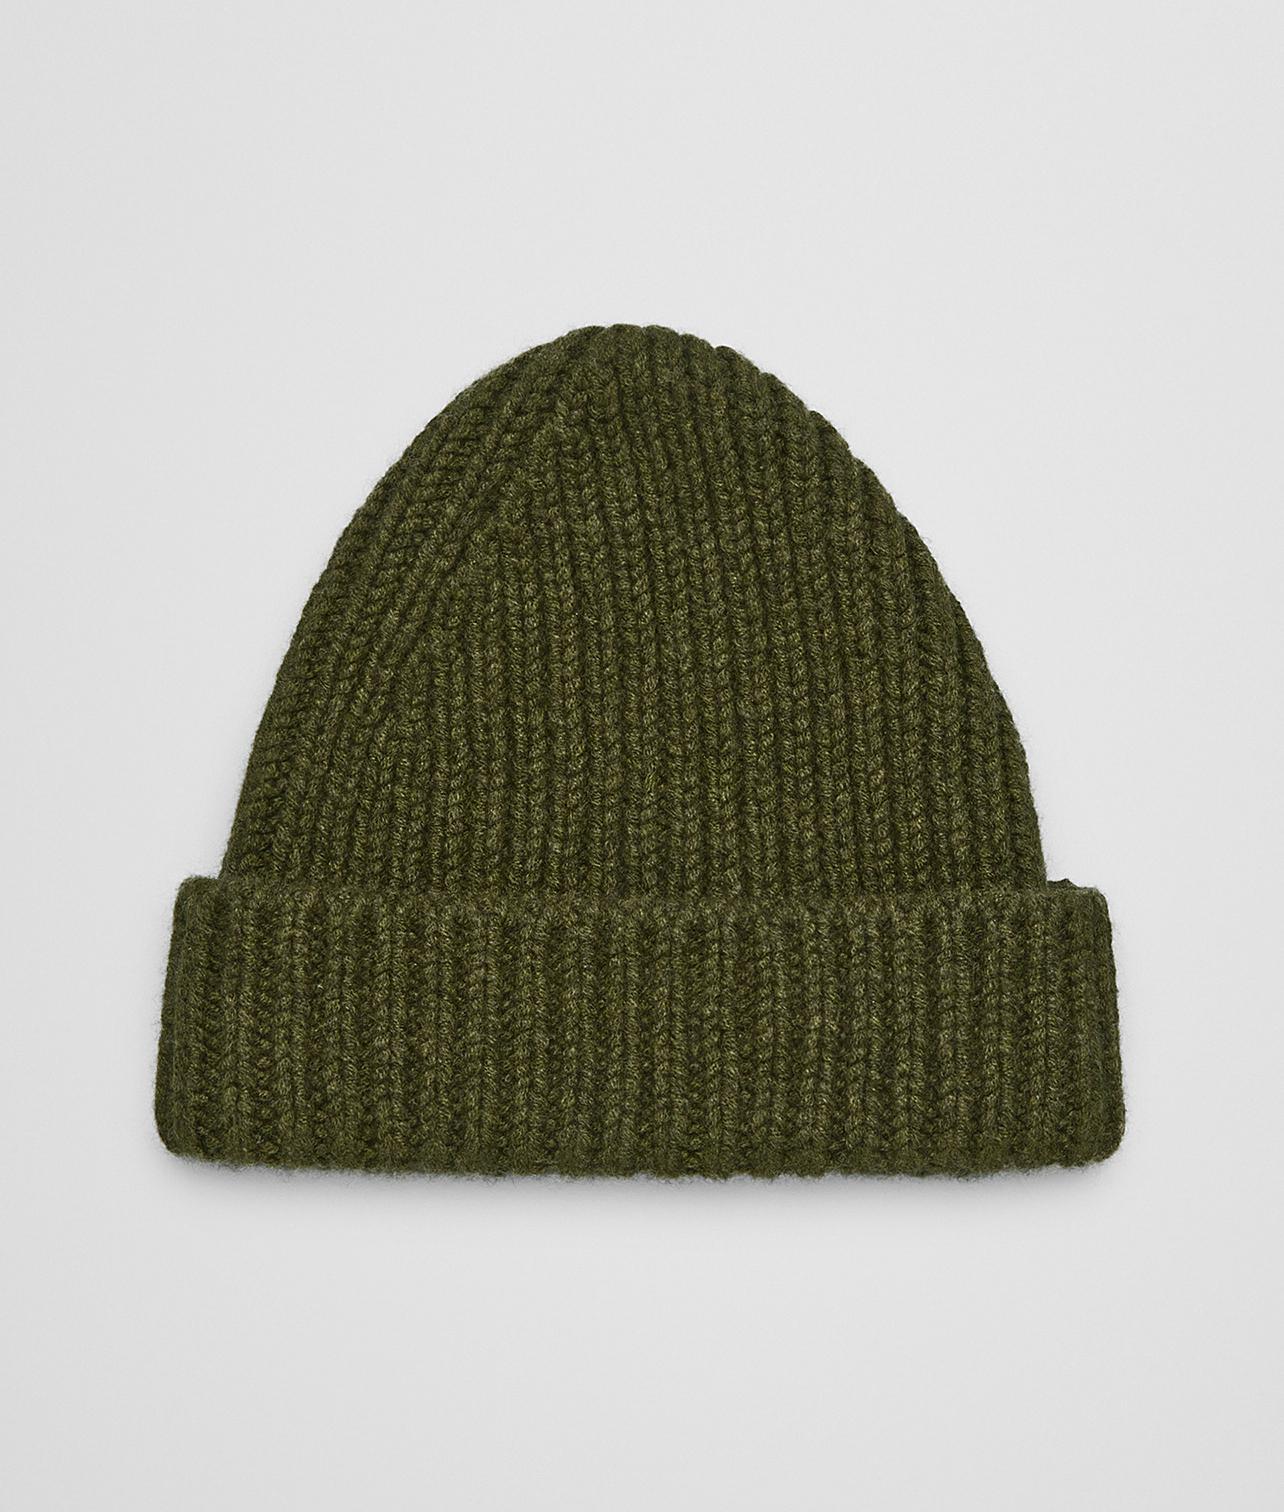 96c09546d83 Lyst - Bottega Veneta Hat In Cashmere in Green